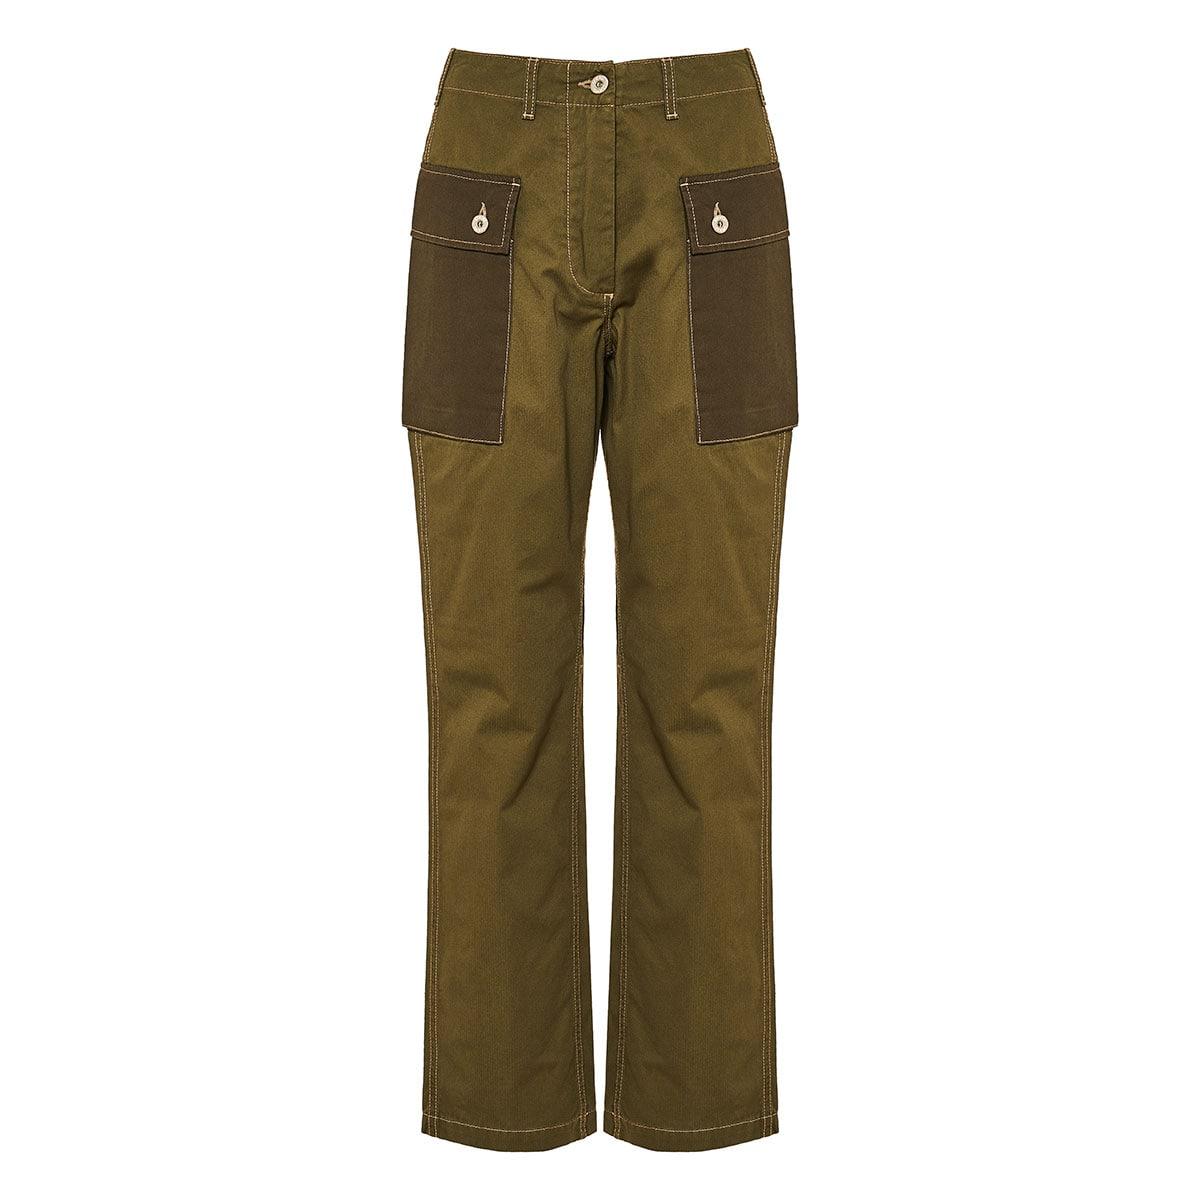 High-waist twill cargo trousers